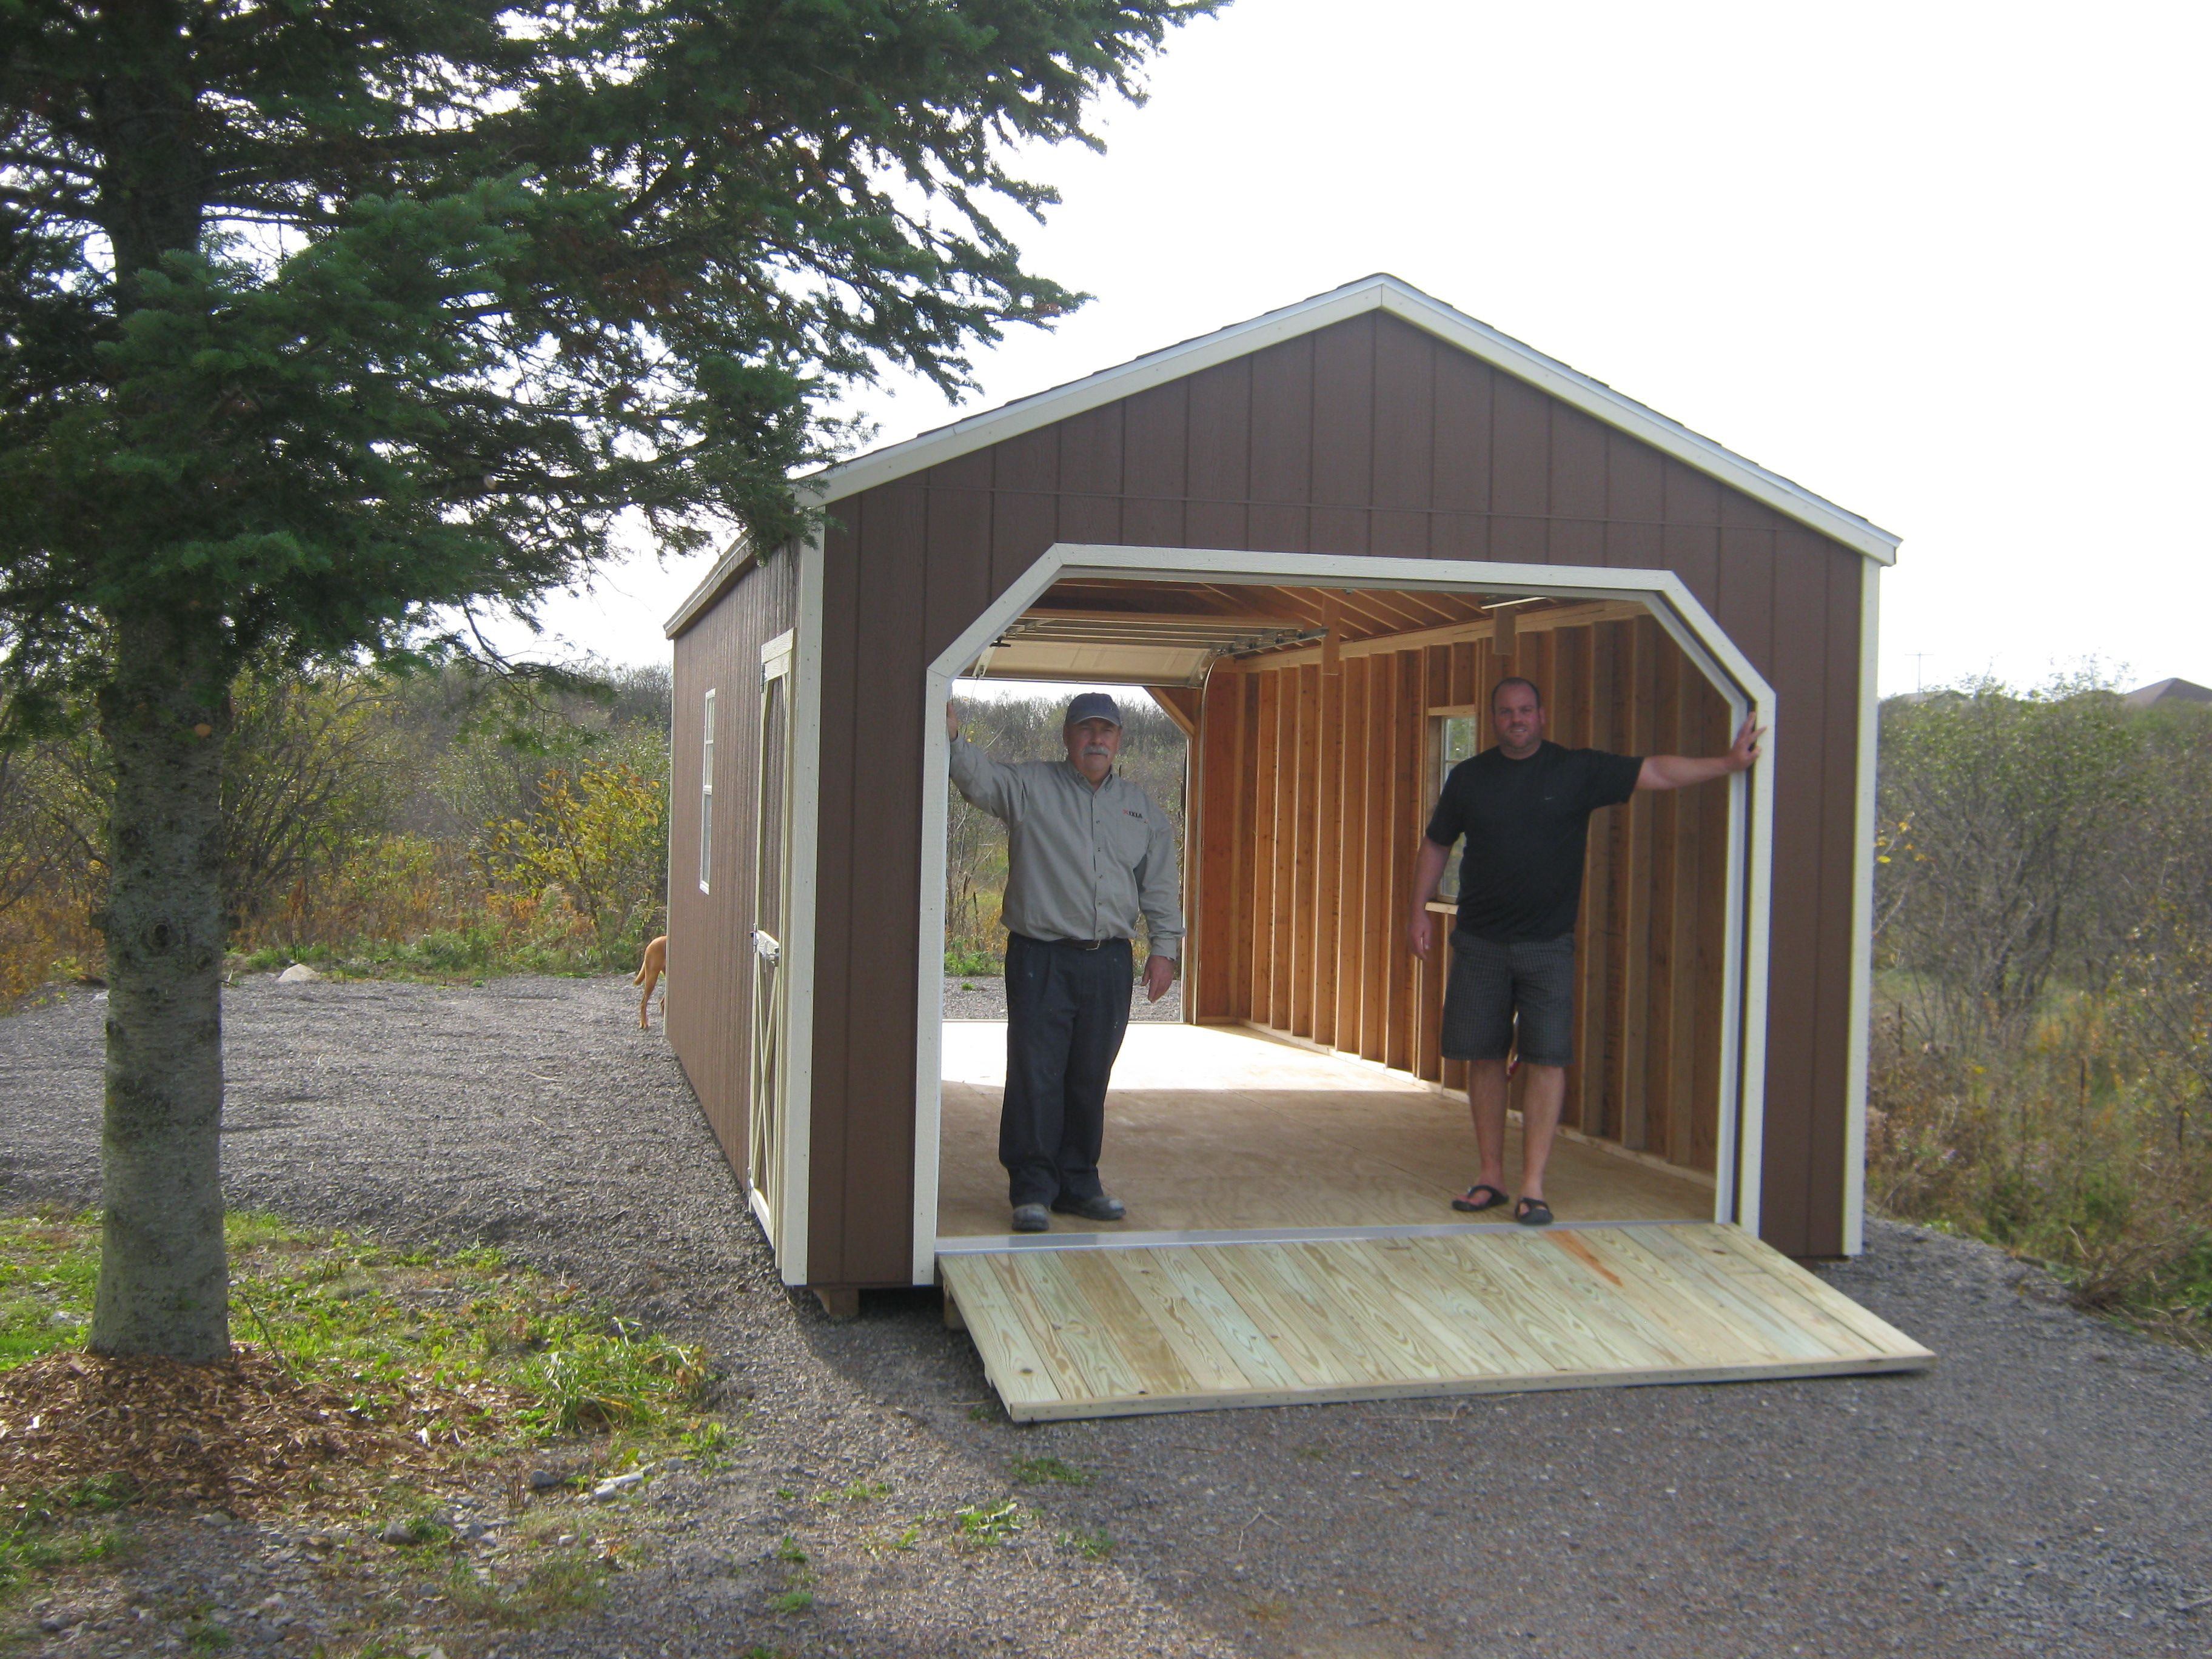 12' X 24' Wooden Portable Garage with double doors